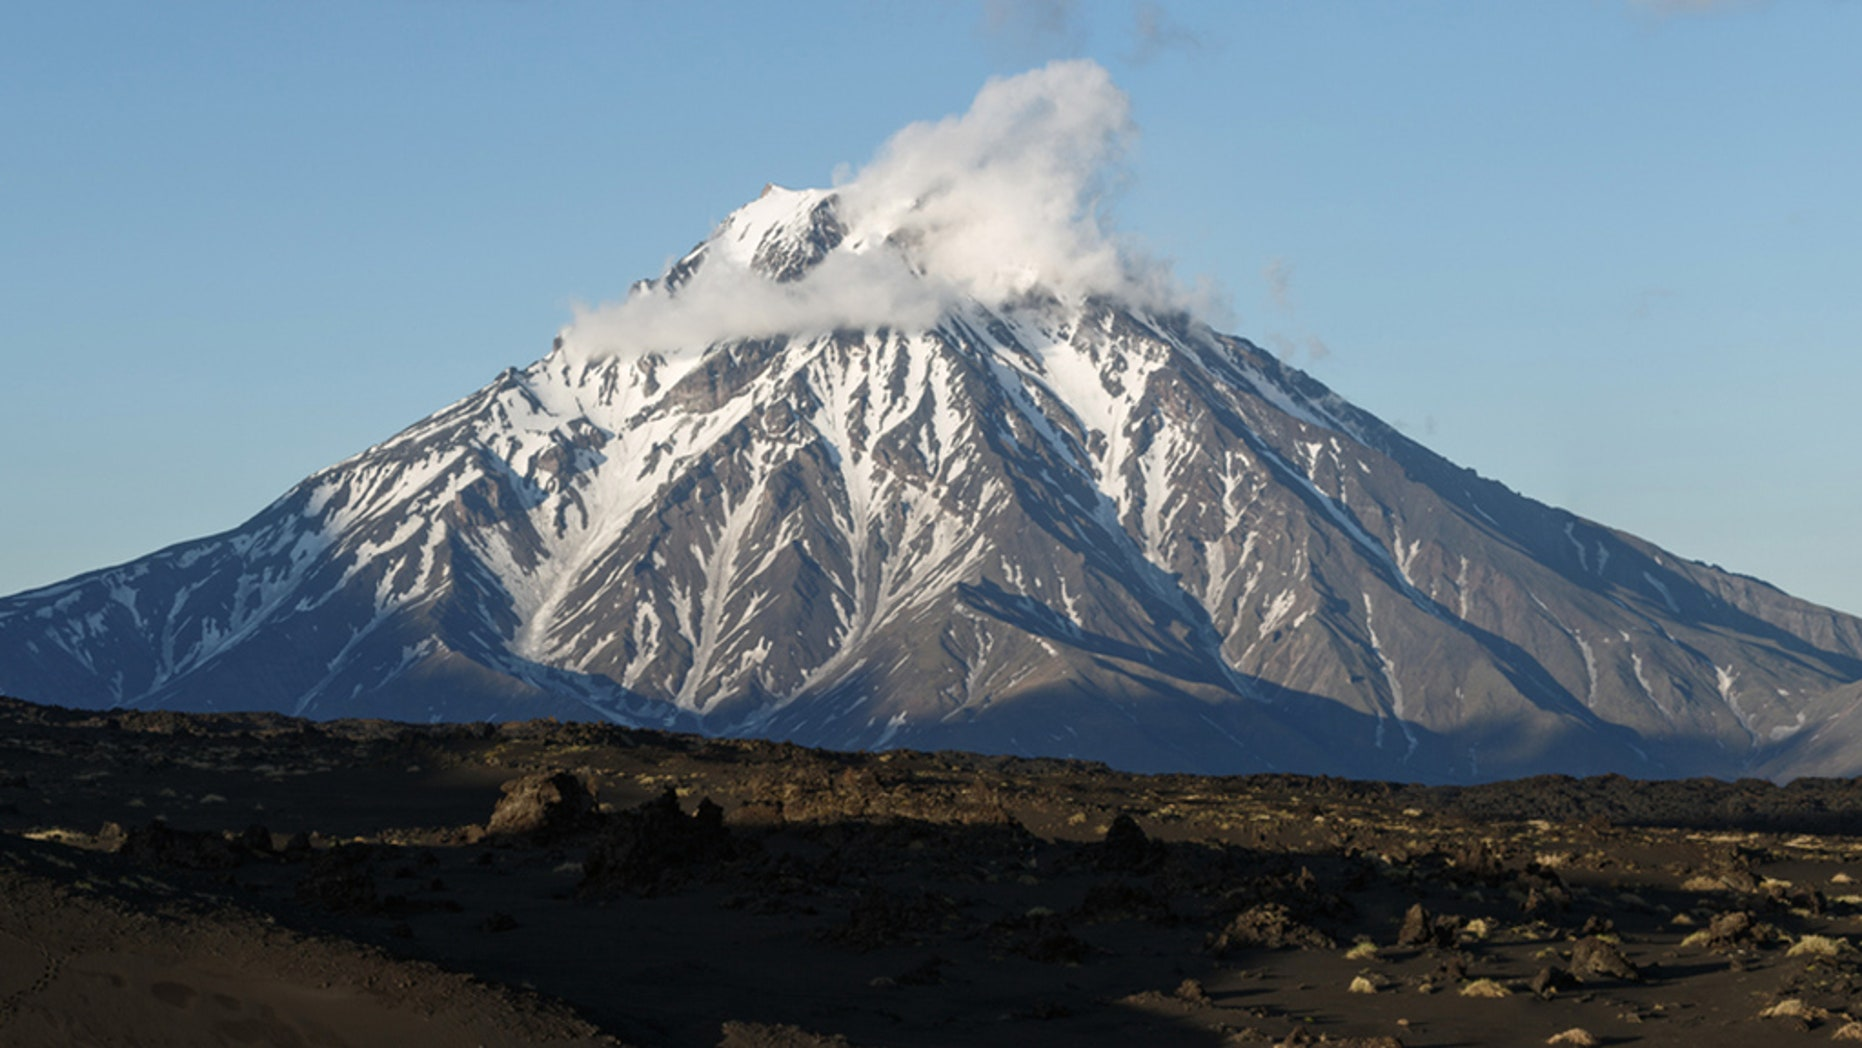 Westlake Legal Group Bolshaya-Udina-volcano-iStock Extinct volcano could wake up and erupt at any moment: scientists fox-news/world/world-regions/russia fox-news/world fox-news/science fox-news/news-events fox news fnc/world fnc e1a90071-e7e1-572a-a234-e5e065178083 David Aaro article